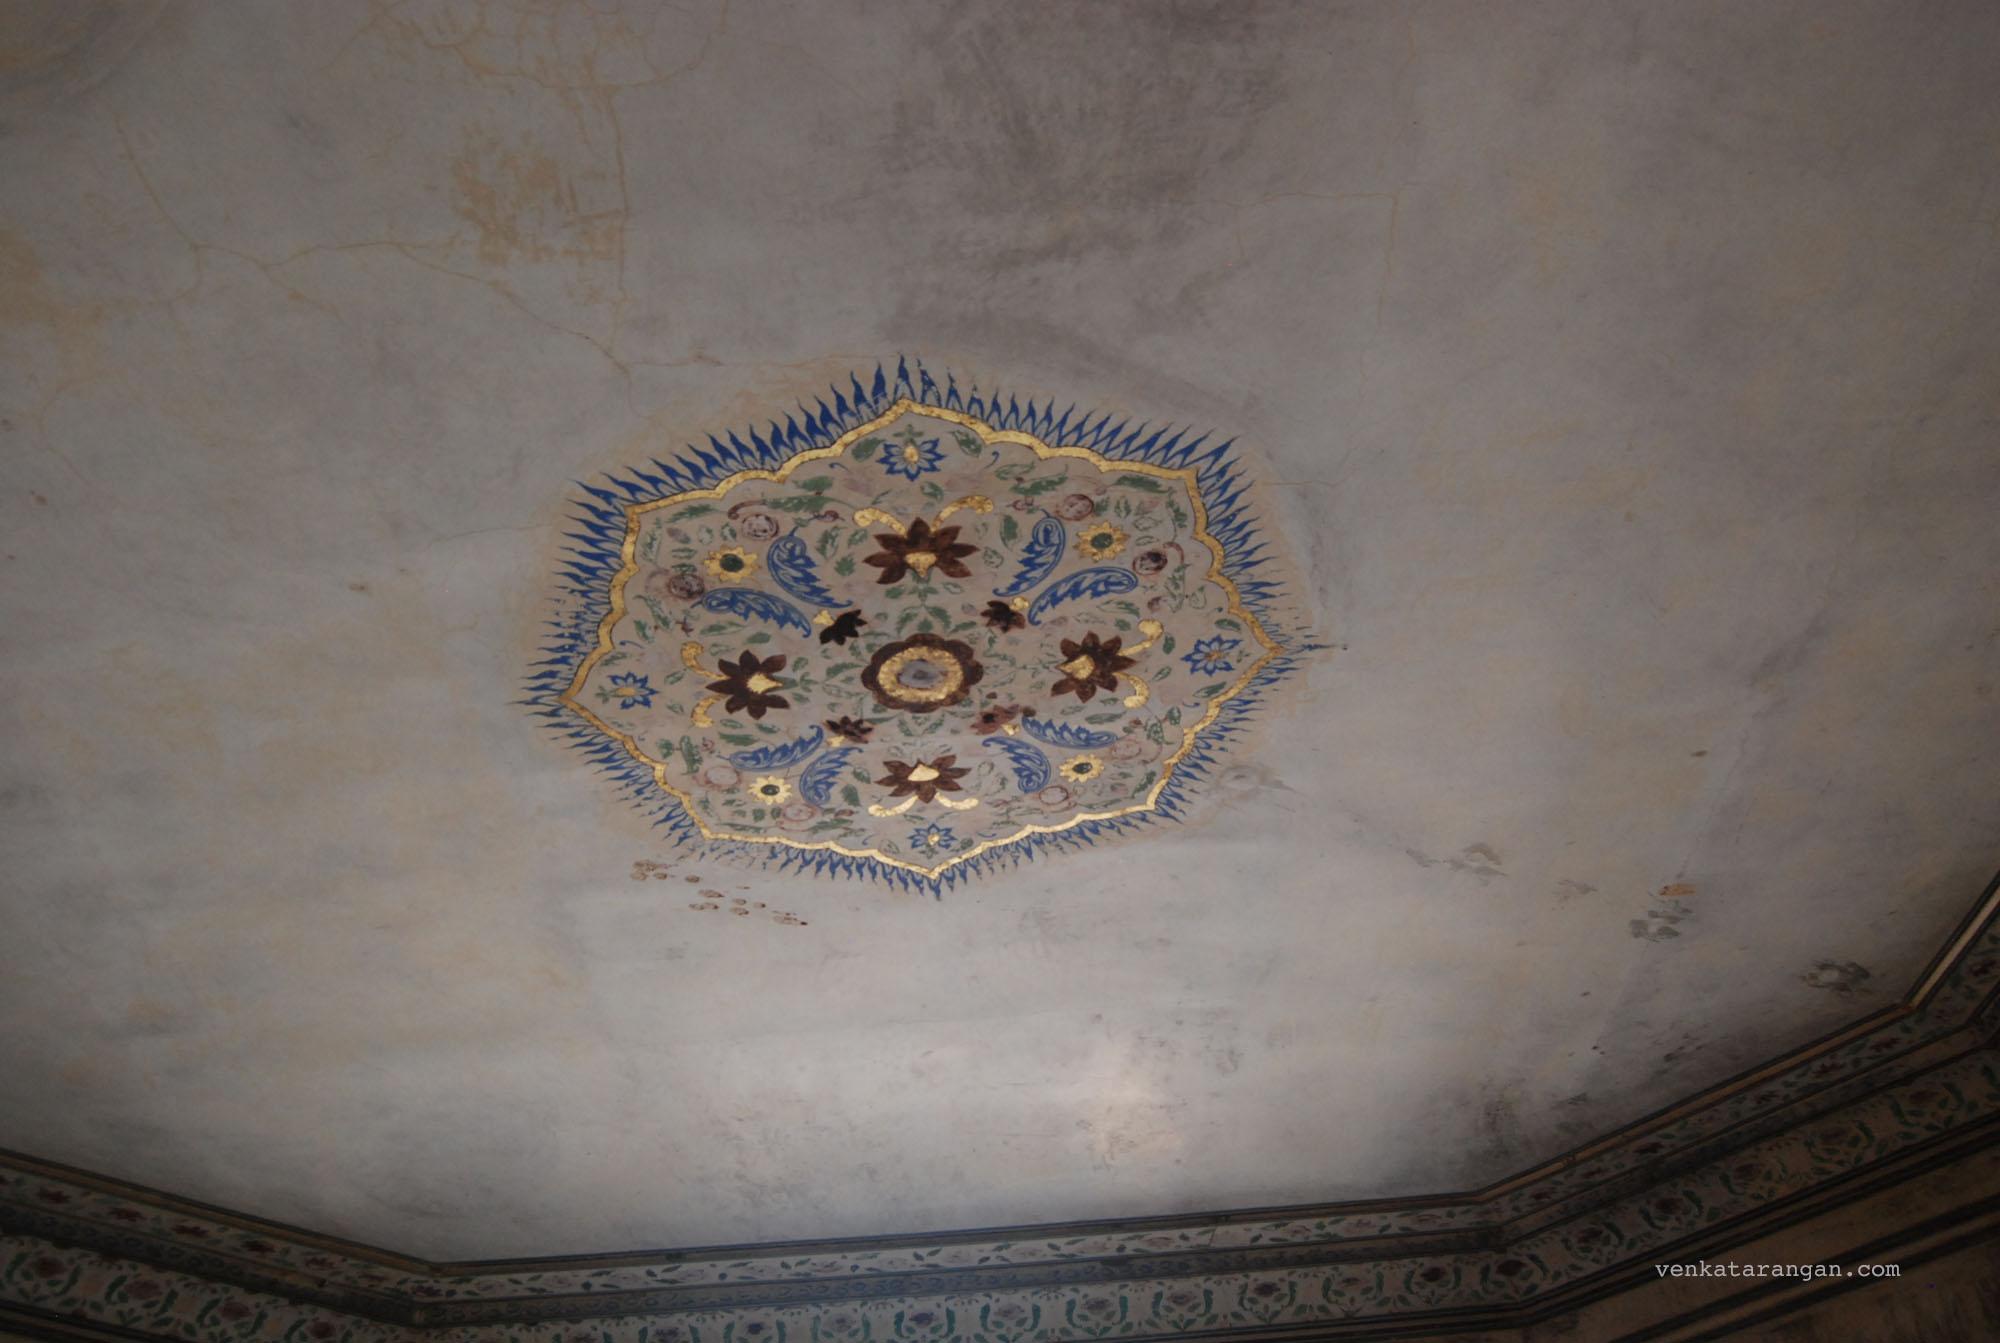 Jai Mandir with glass inlaid ceilings